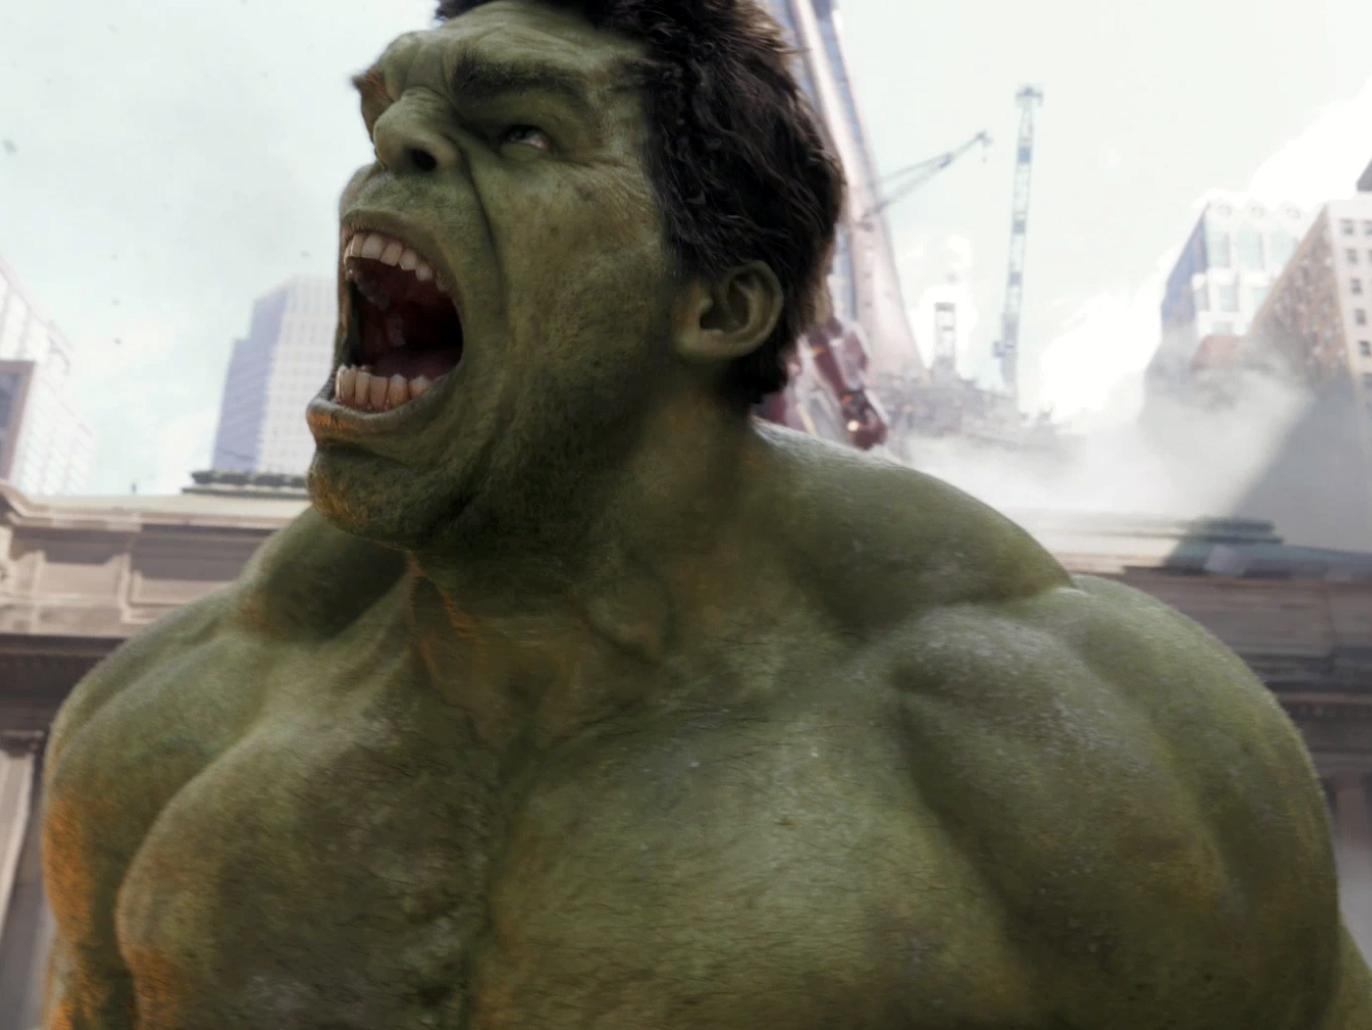 Box Office Predictions: 'Avengers' to Torpedo 'Battleship'